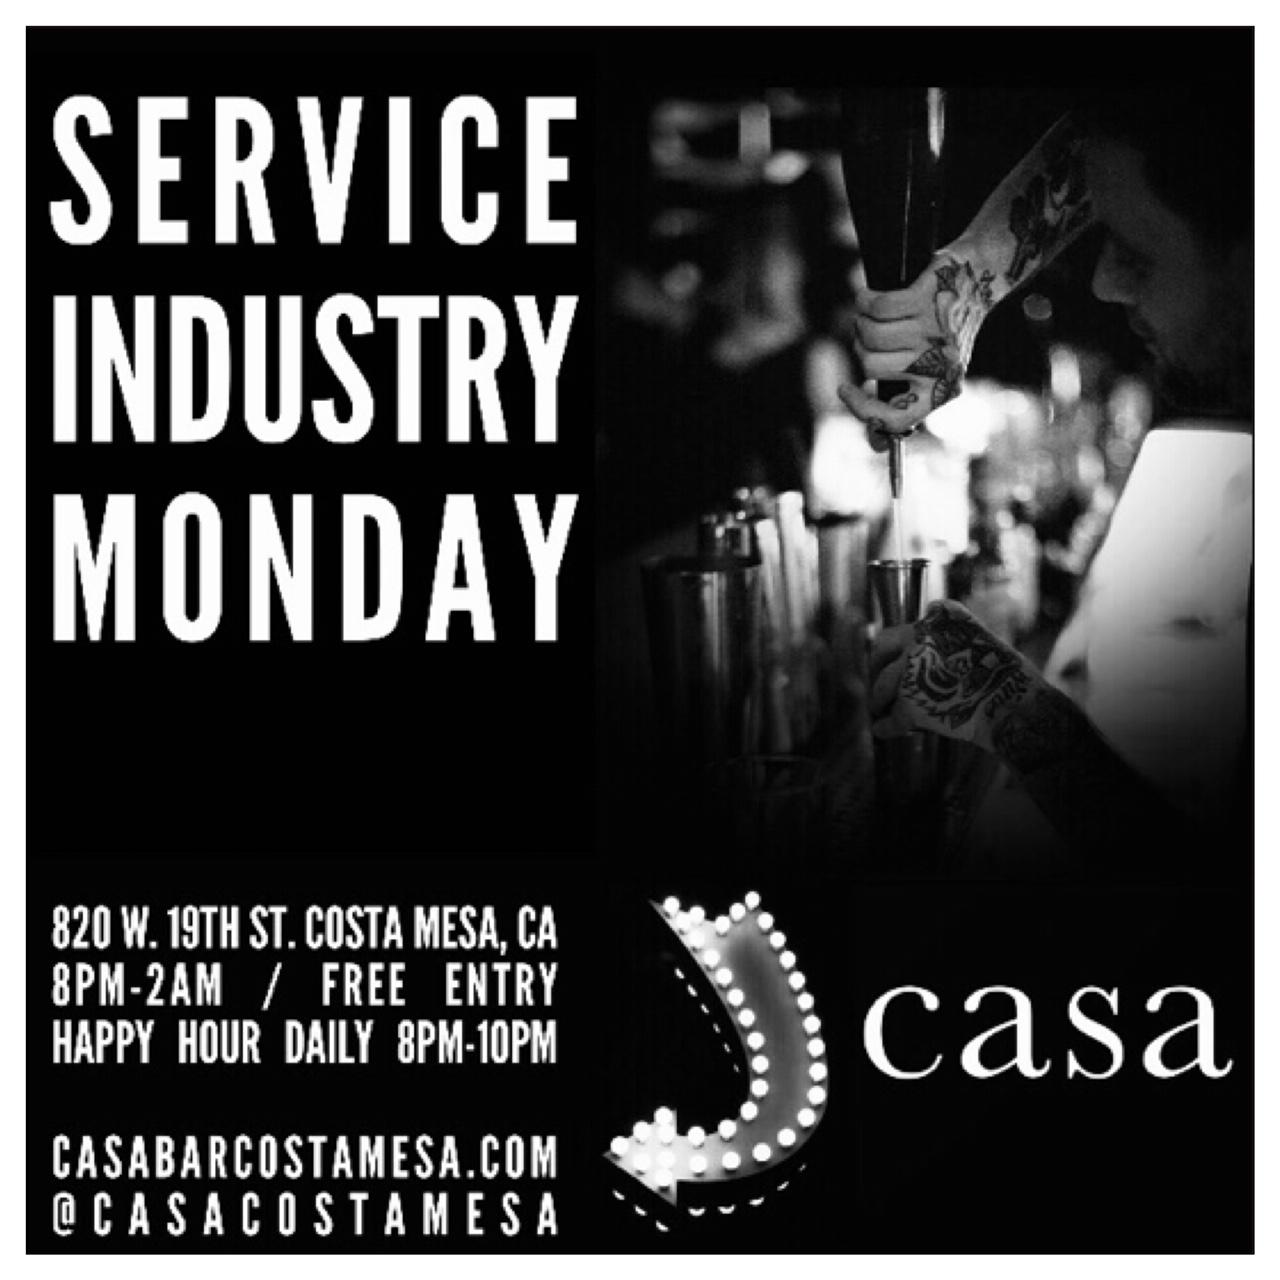 ServiceIndustry-Casa.JPG